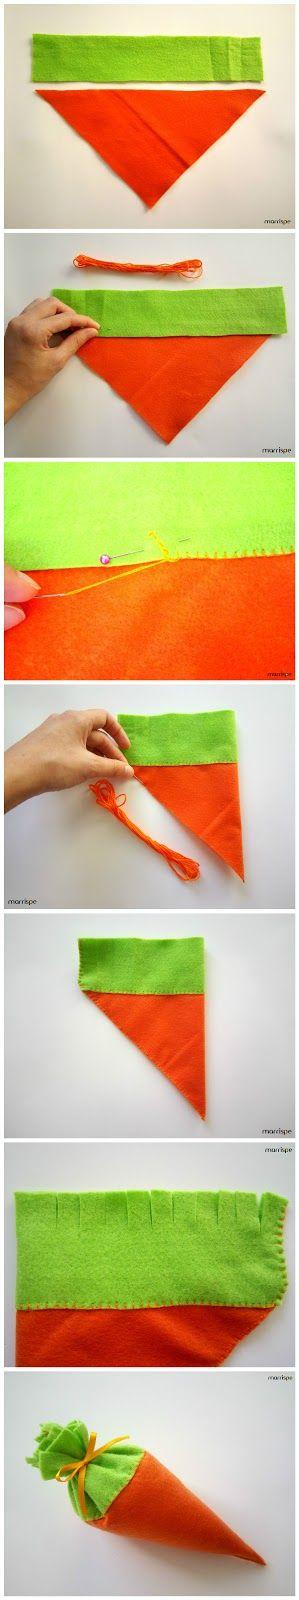 Tutorial de como fazer cenoura em feltro  #artesanato #cenoura #tutorial #diy #facavocemesmo #handmade #Pascoa #dica #ideia #pap #feltro #marrispe